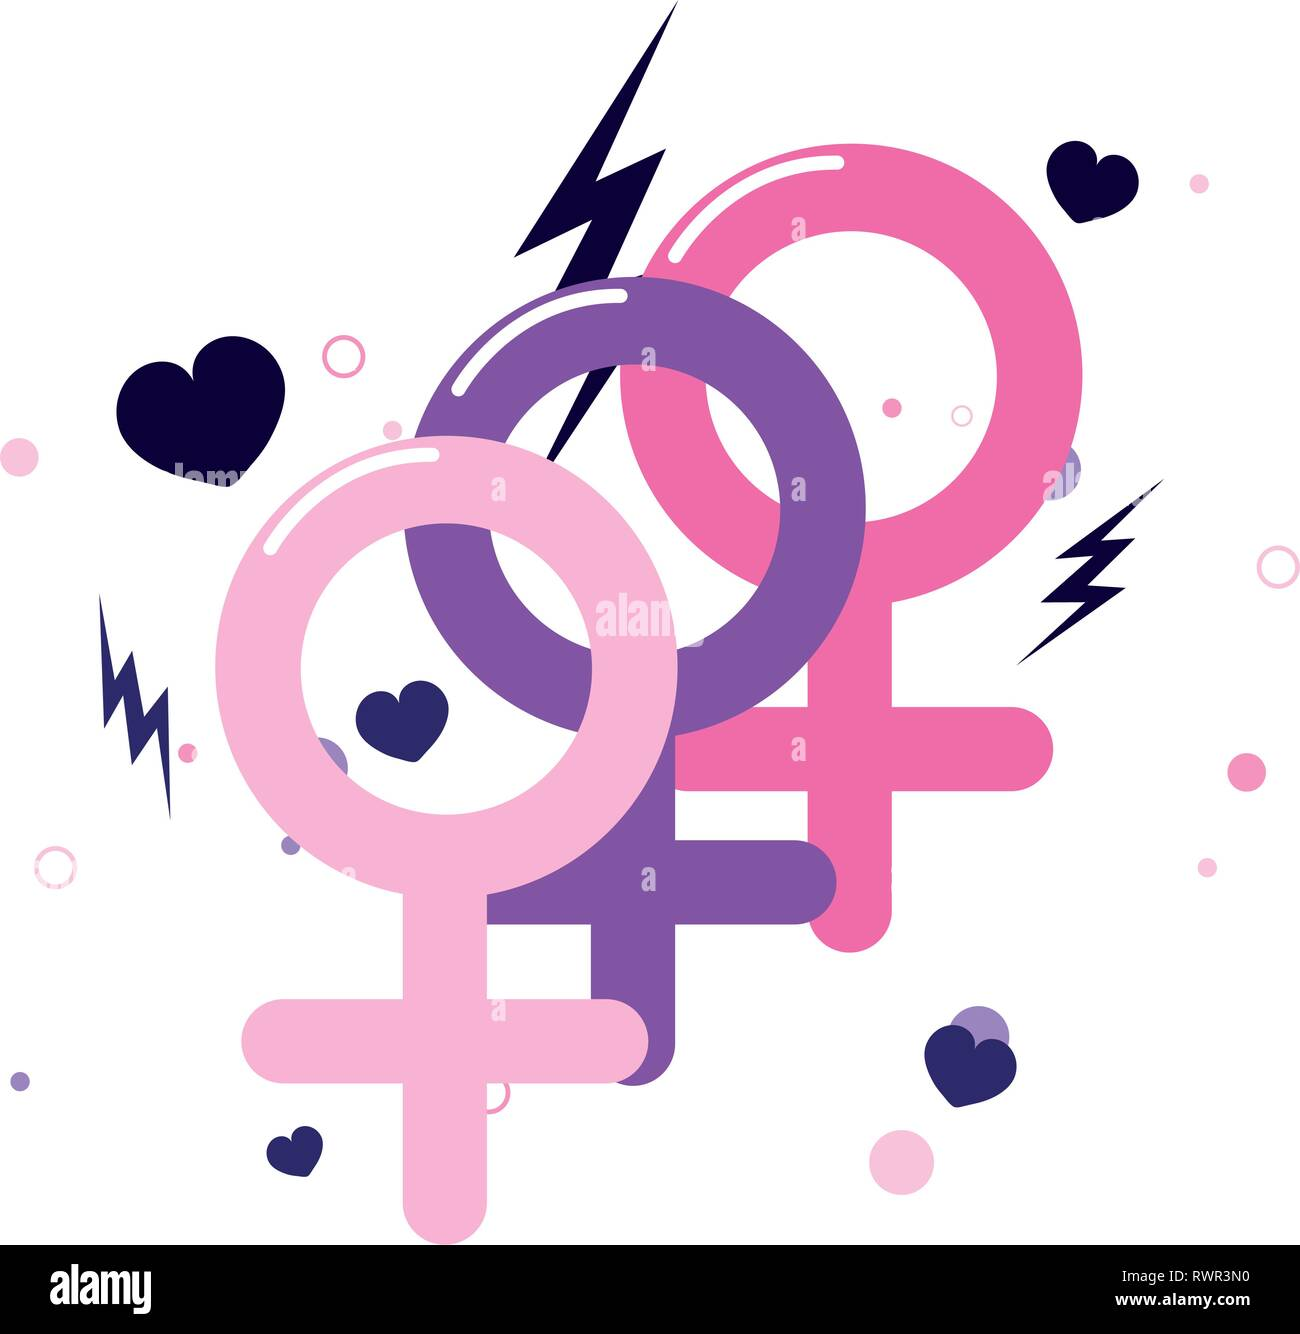 gender feminism signals girl power vector illustration - Stock Image